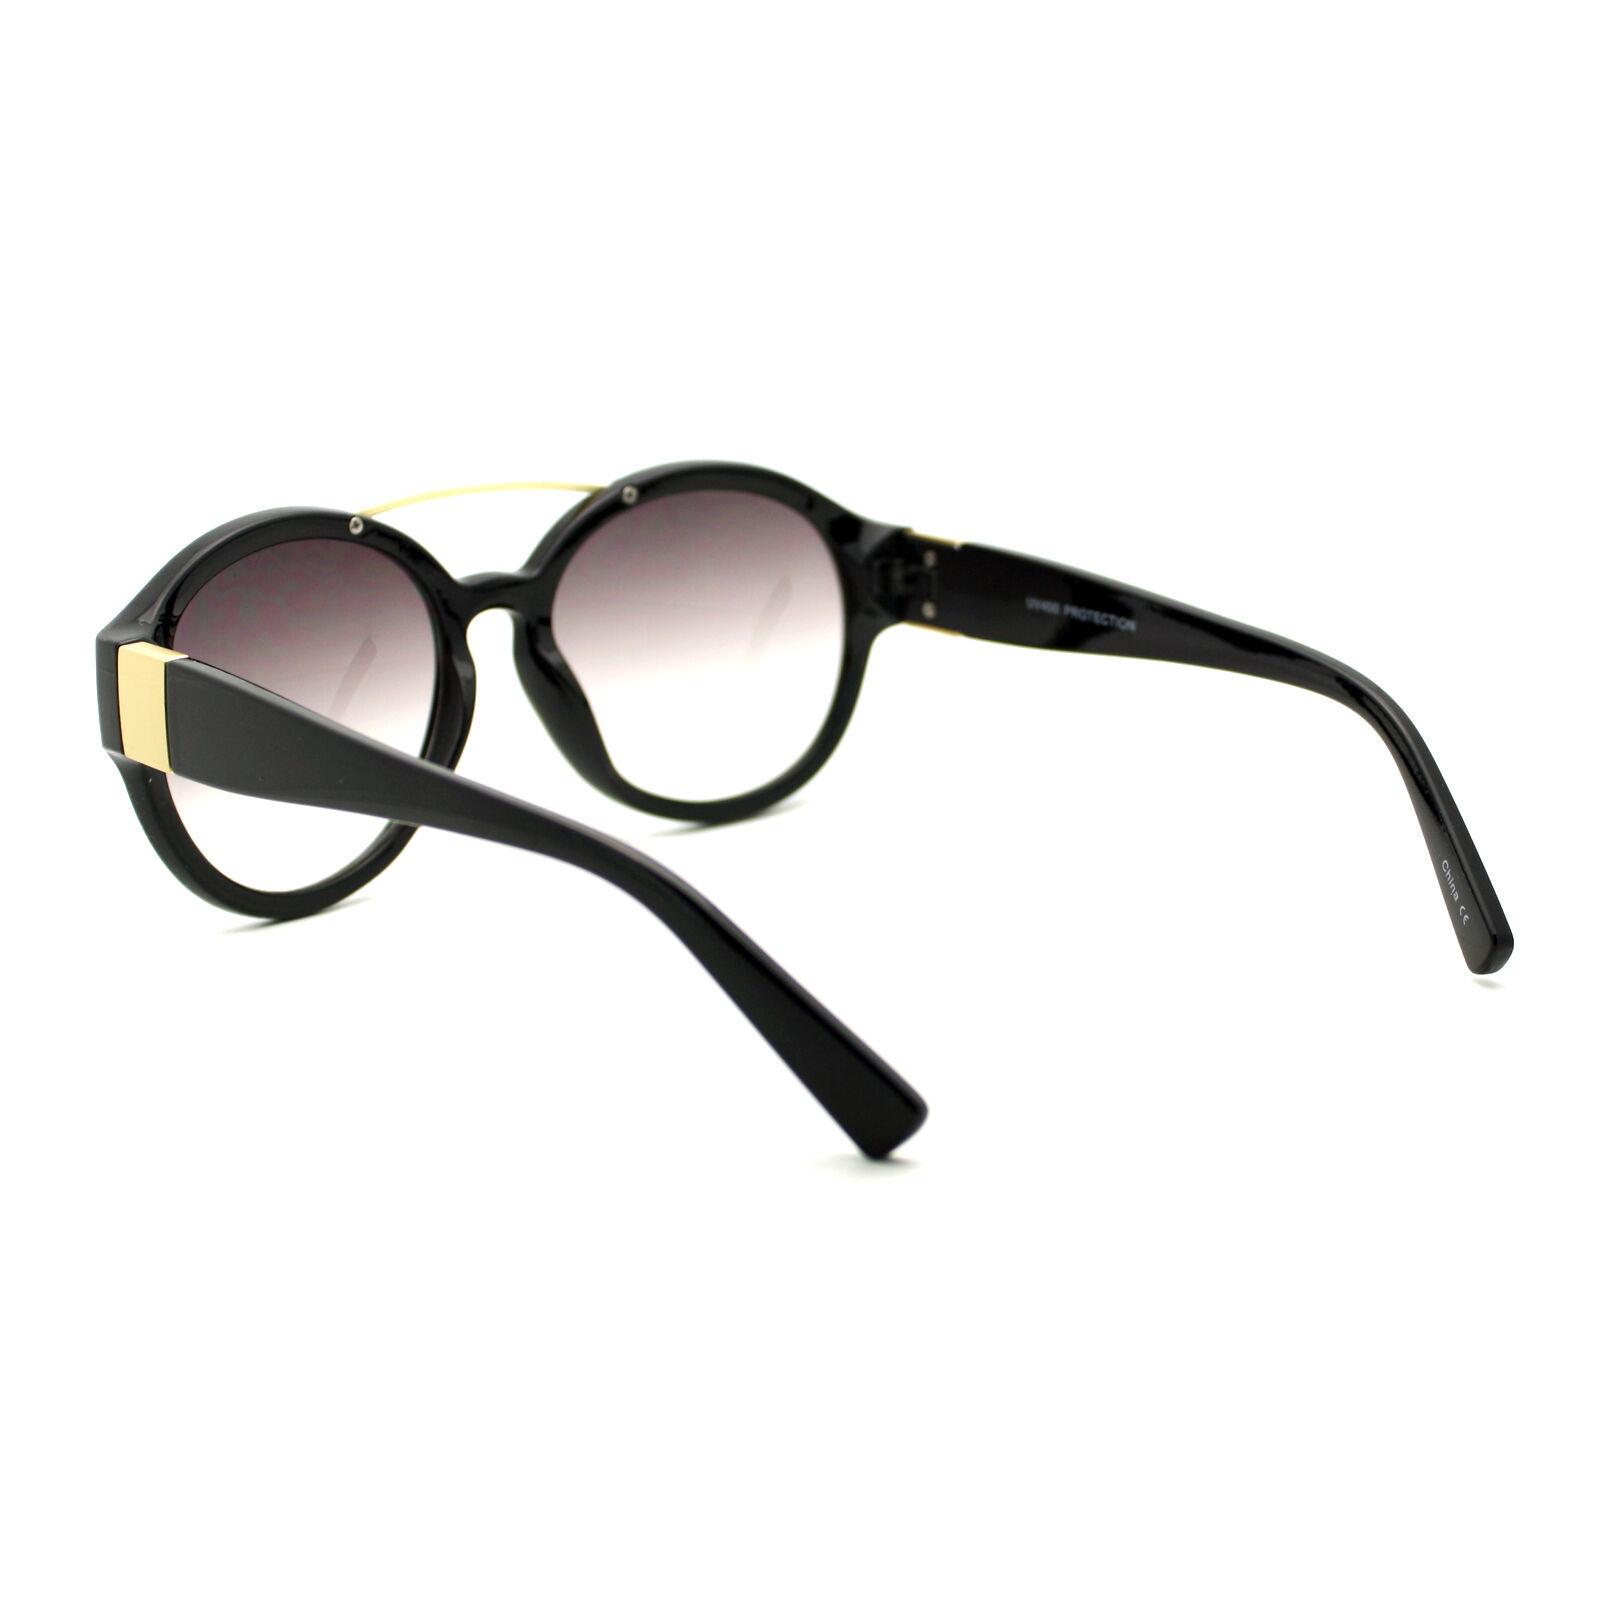 Womens Sunglasses Oversized Round Retro Hipster Fashion Shades